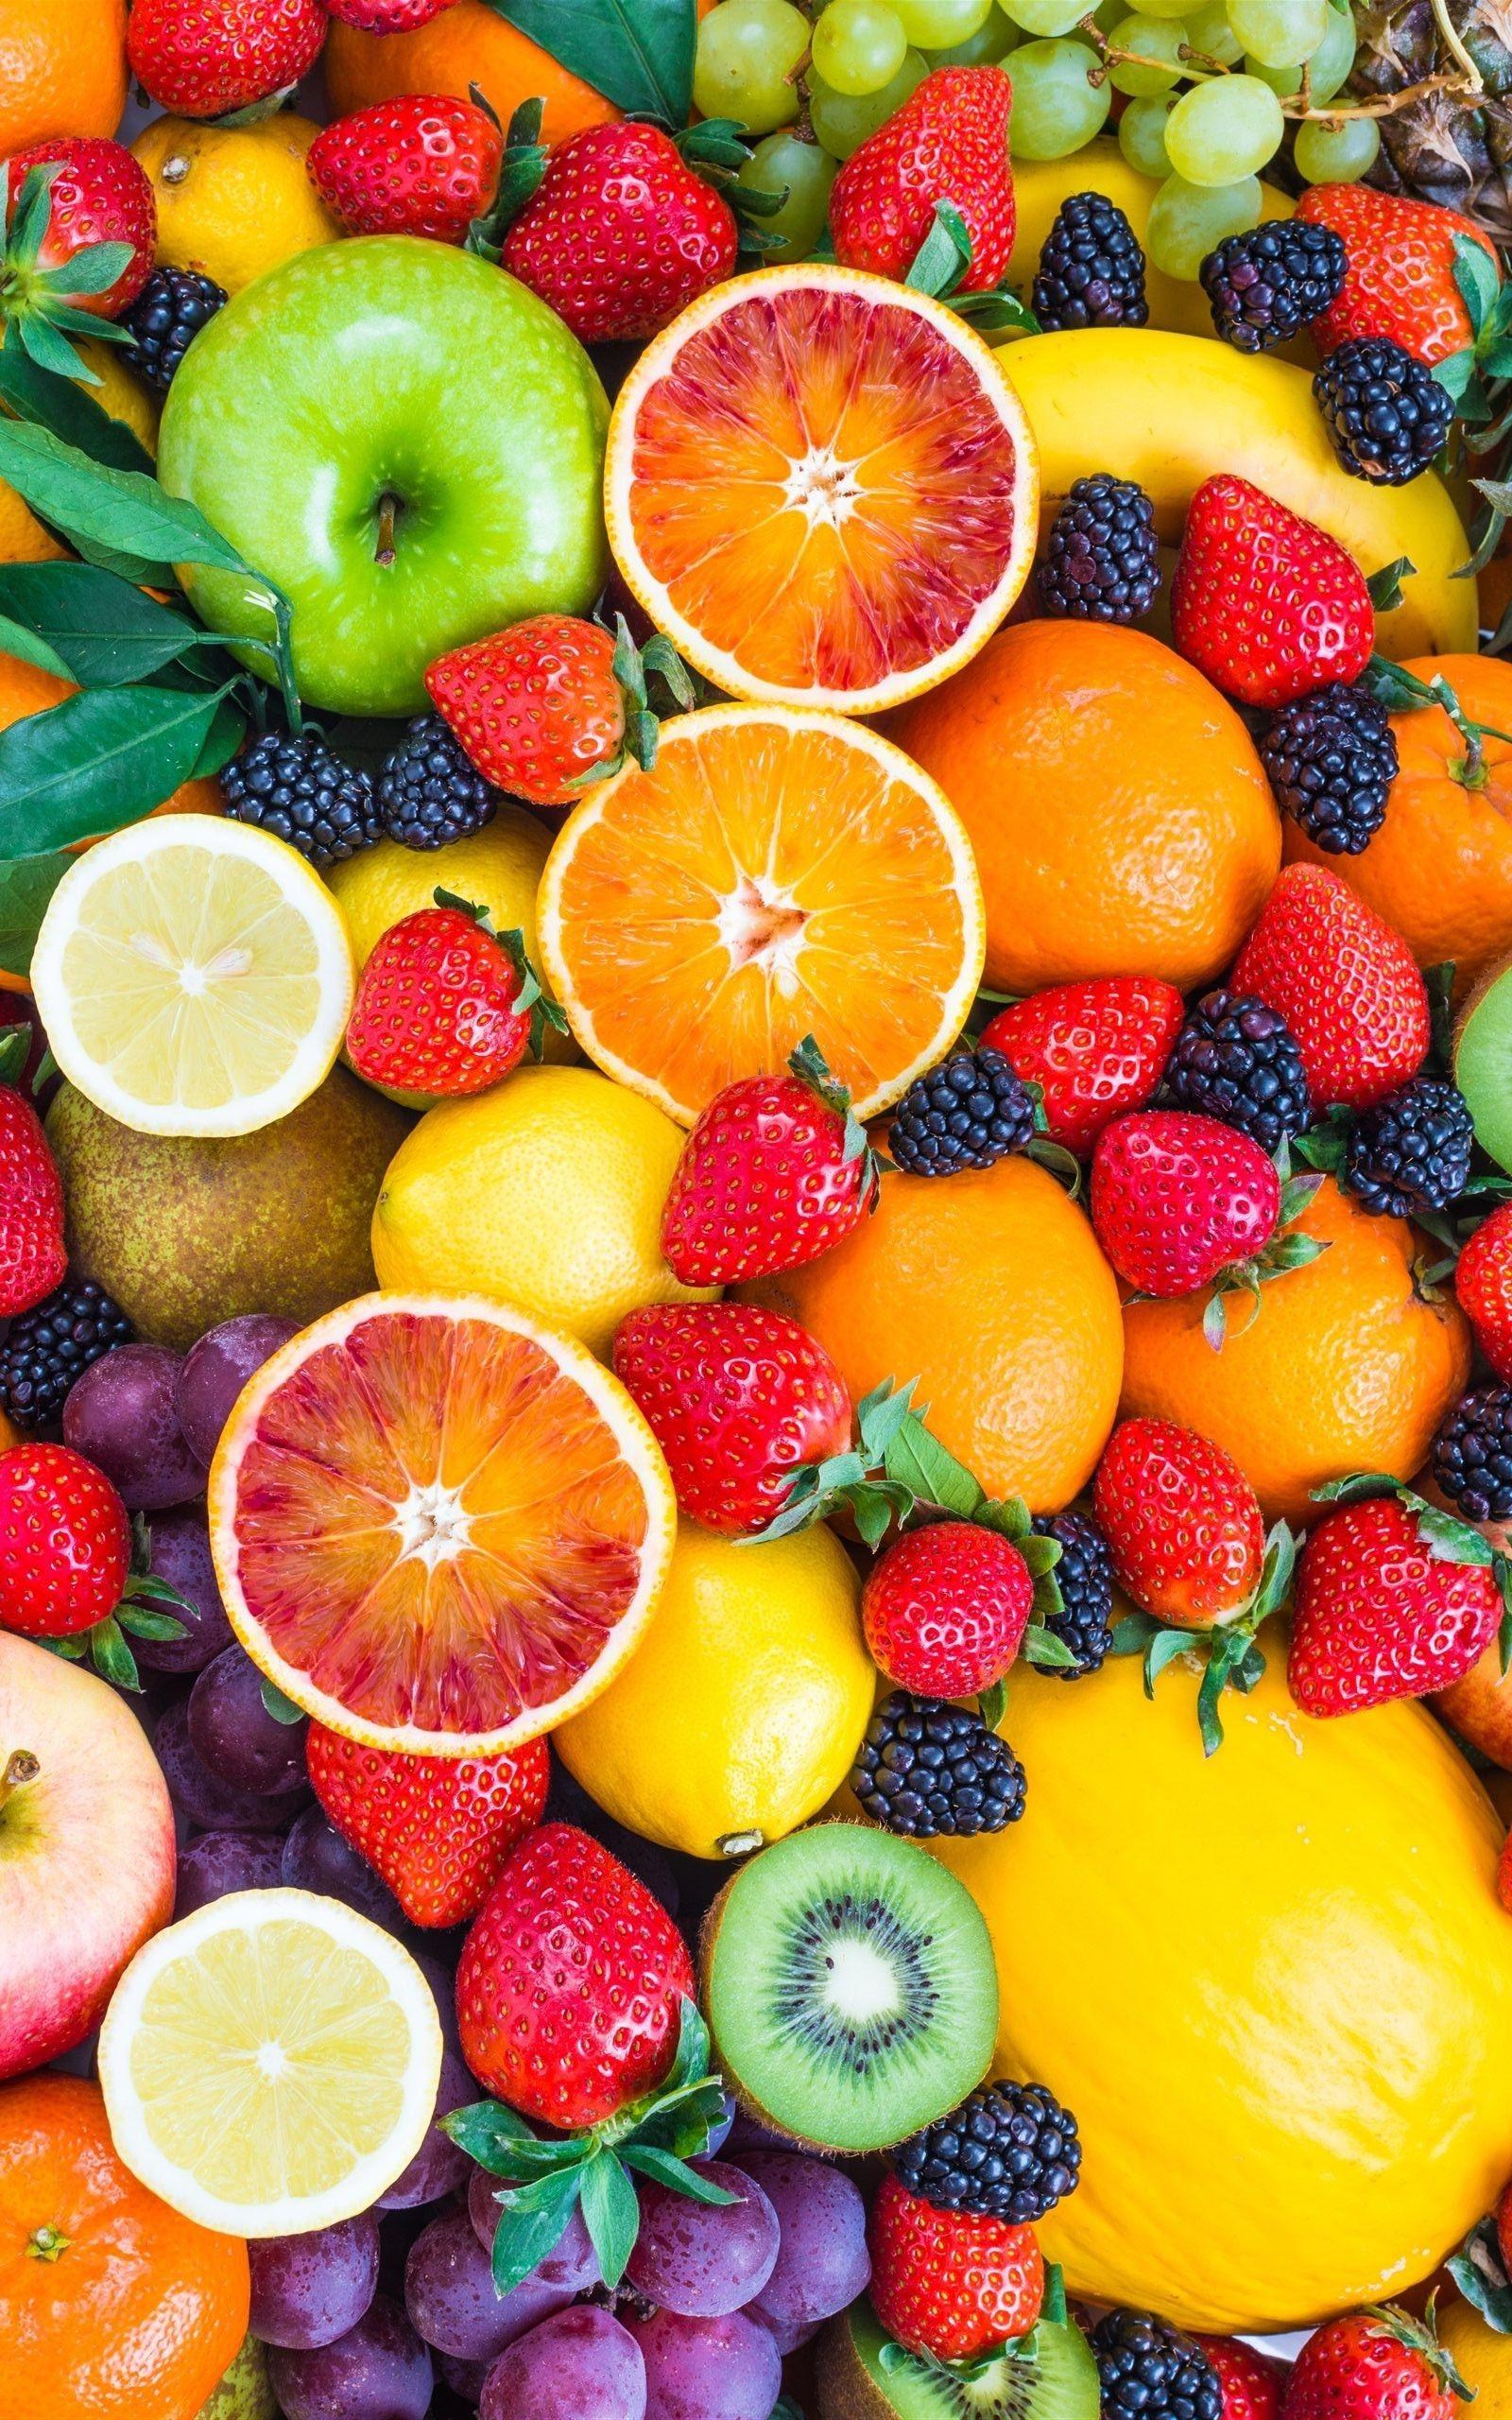 Best Fresh Fruit Wallpaper iPhone iPhoneWallpapers Food 1600x2560